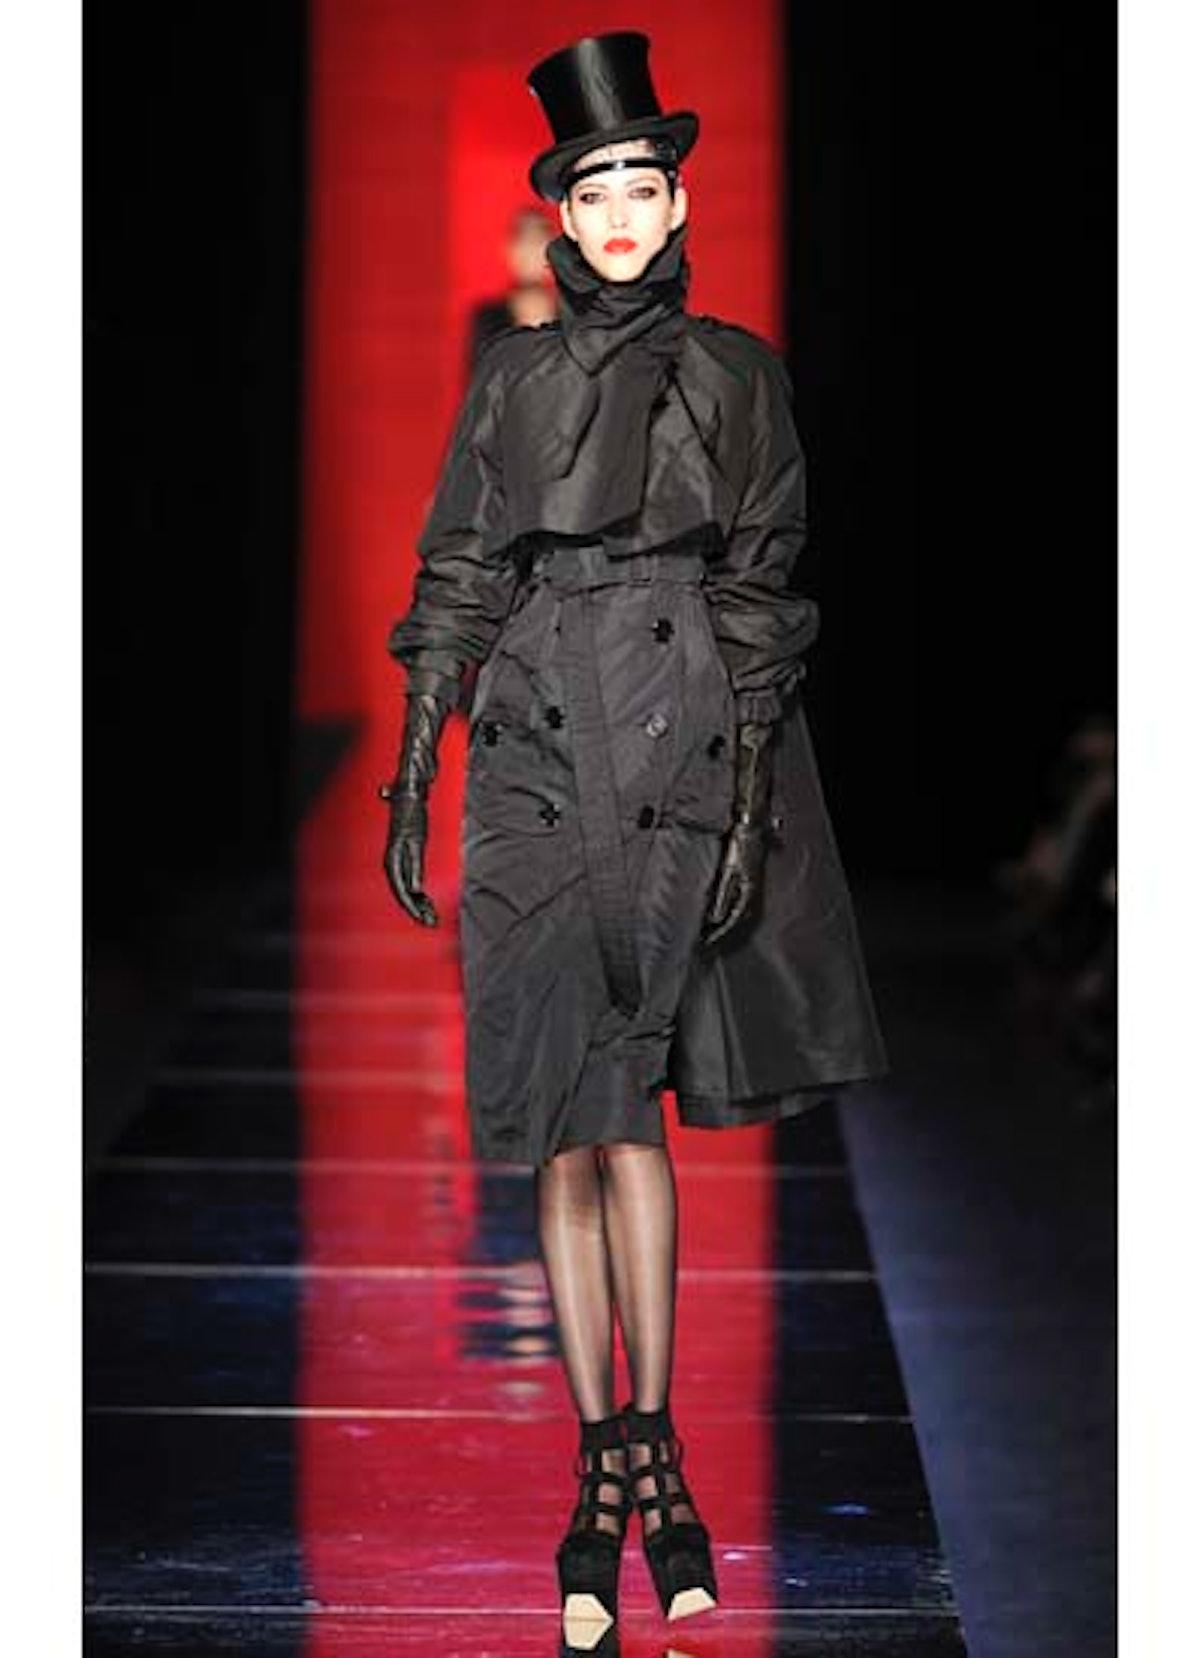 fass-jean-paul-gaultier-couture-2012-runway-06-v.jpg